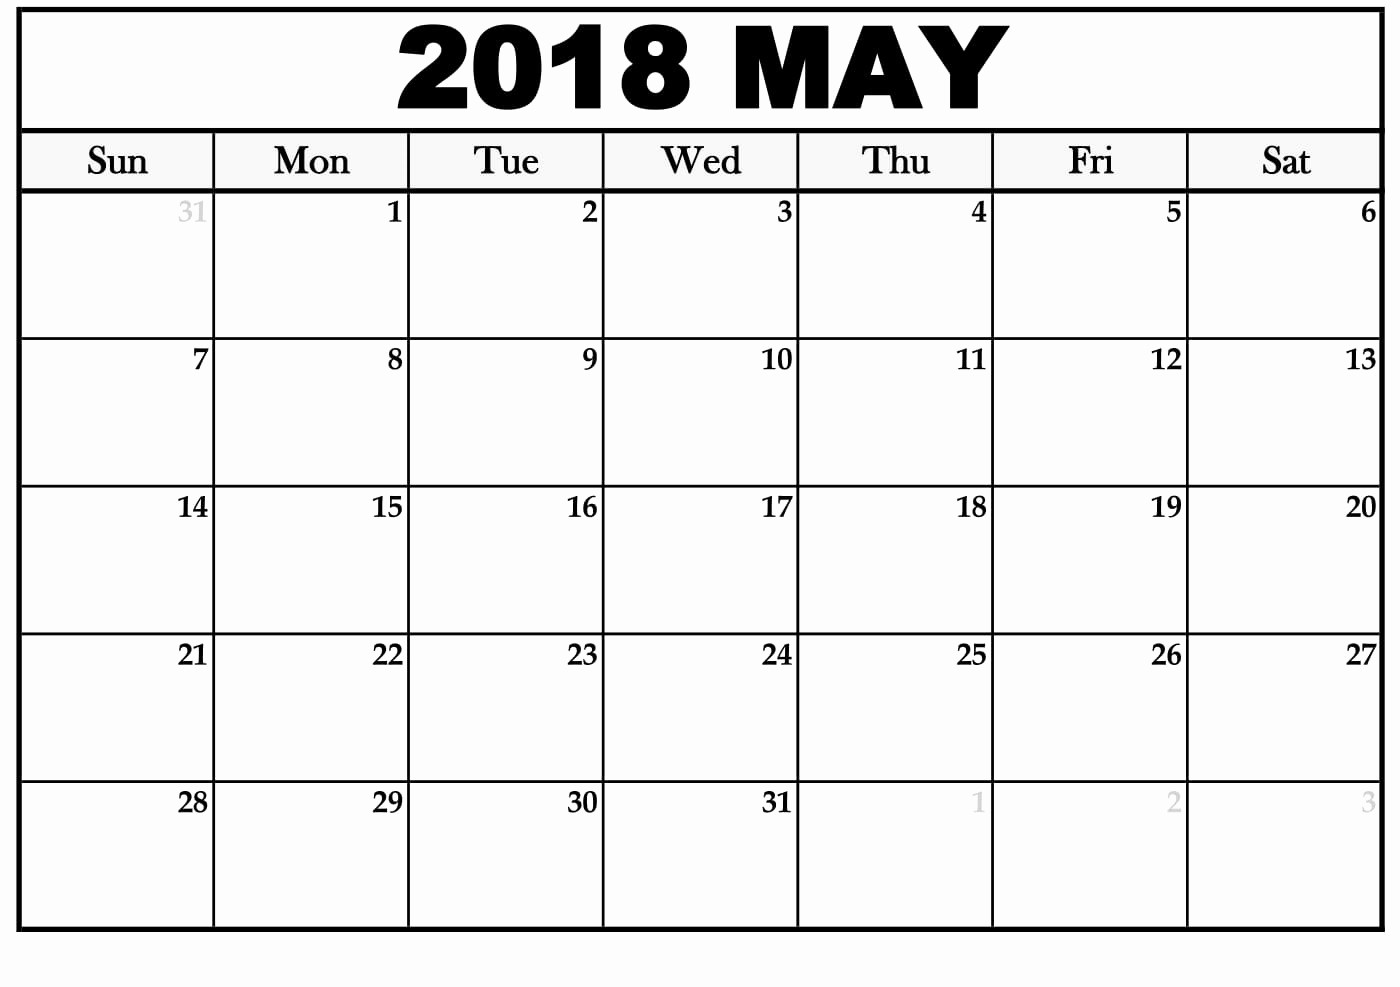 Blank May 2018 Calendar Printable Unique May 2018 Blank Calendar